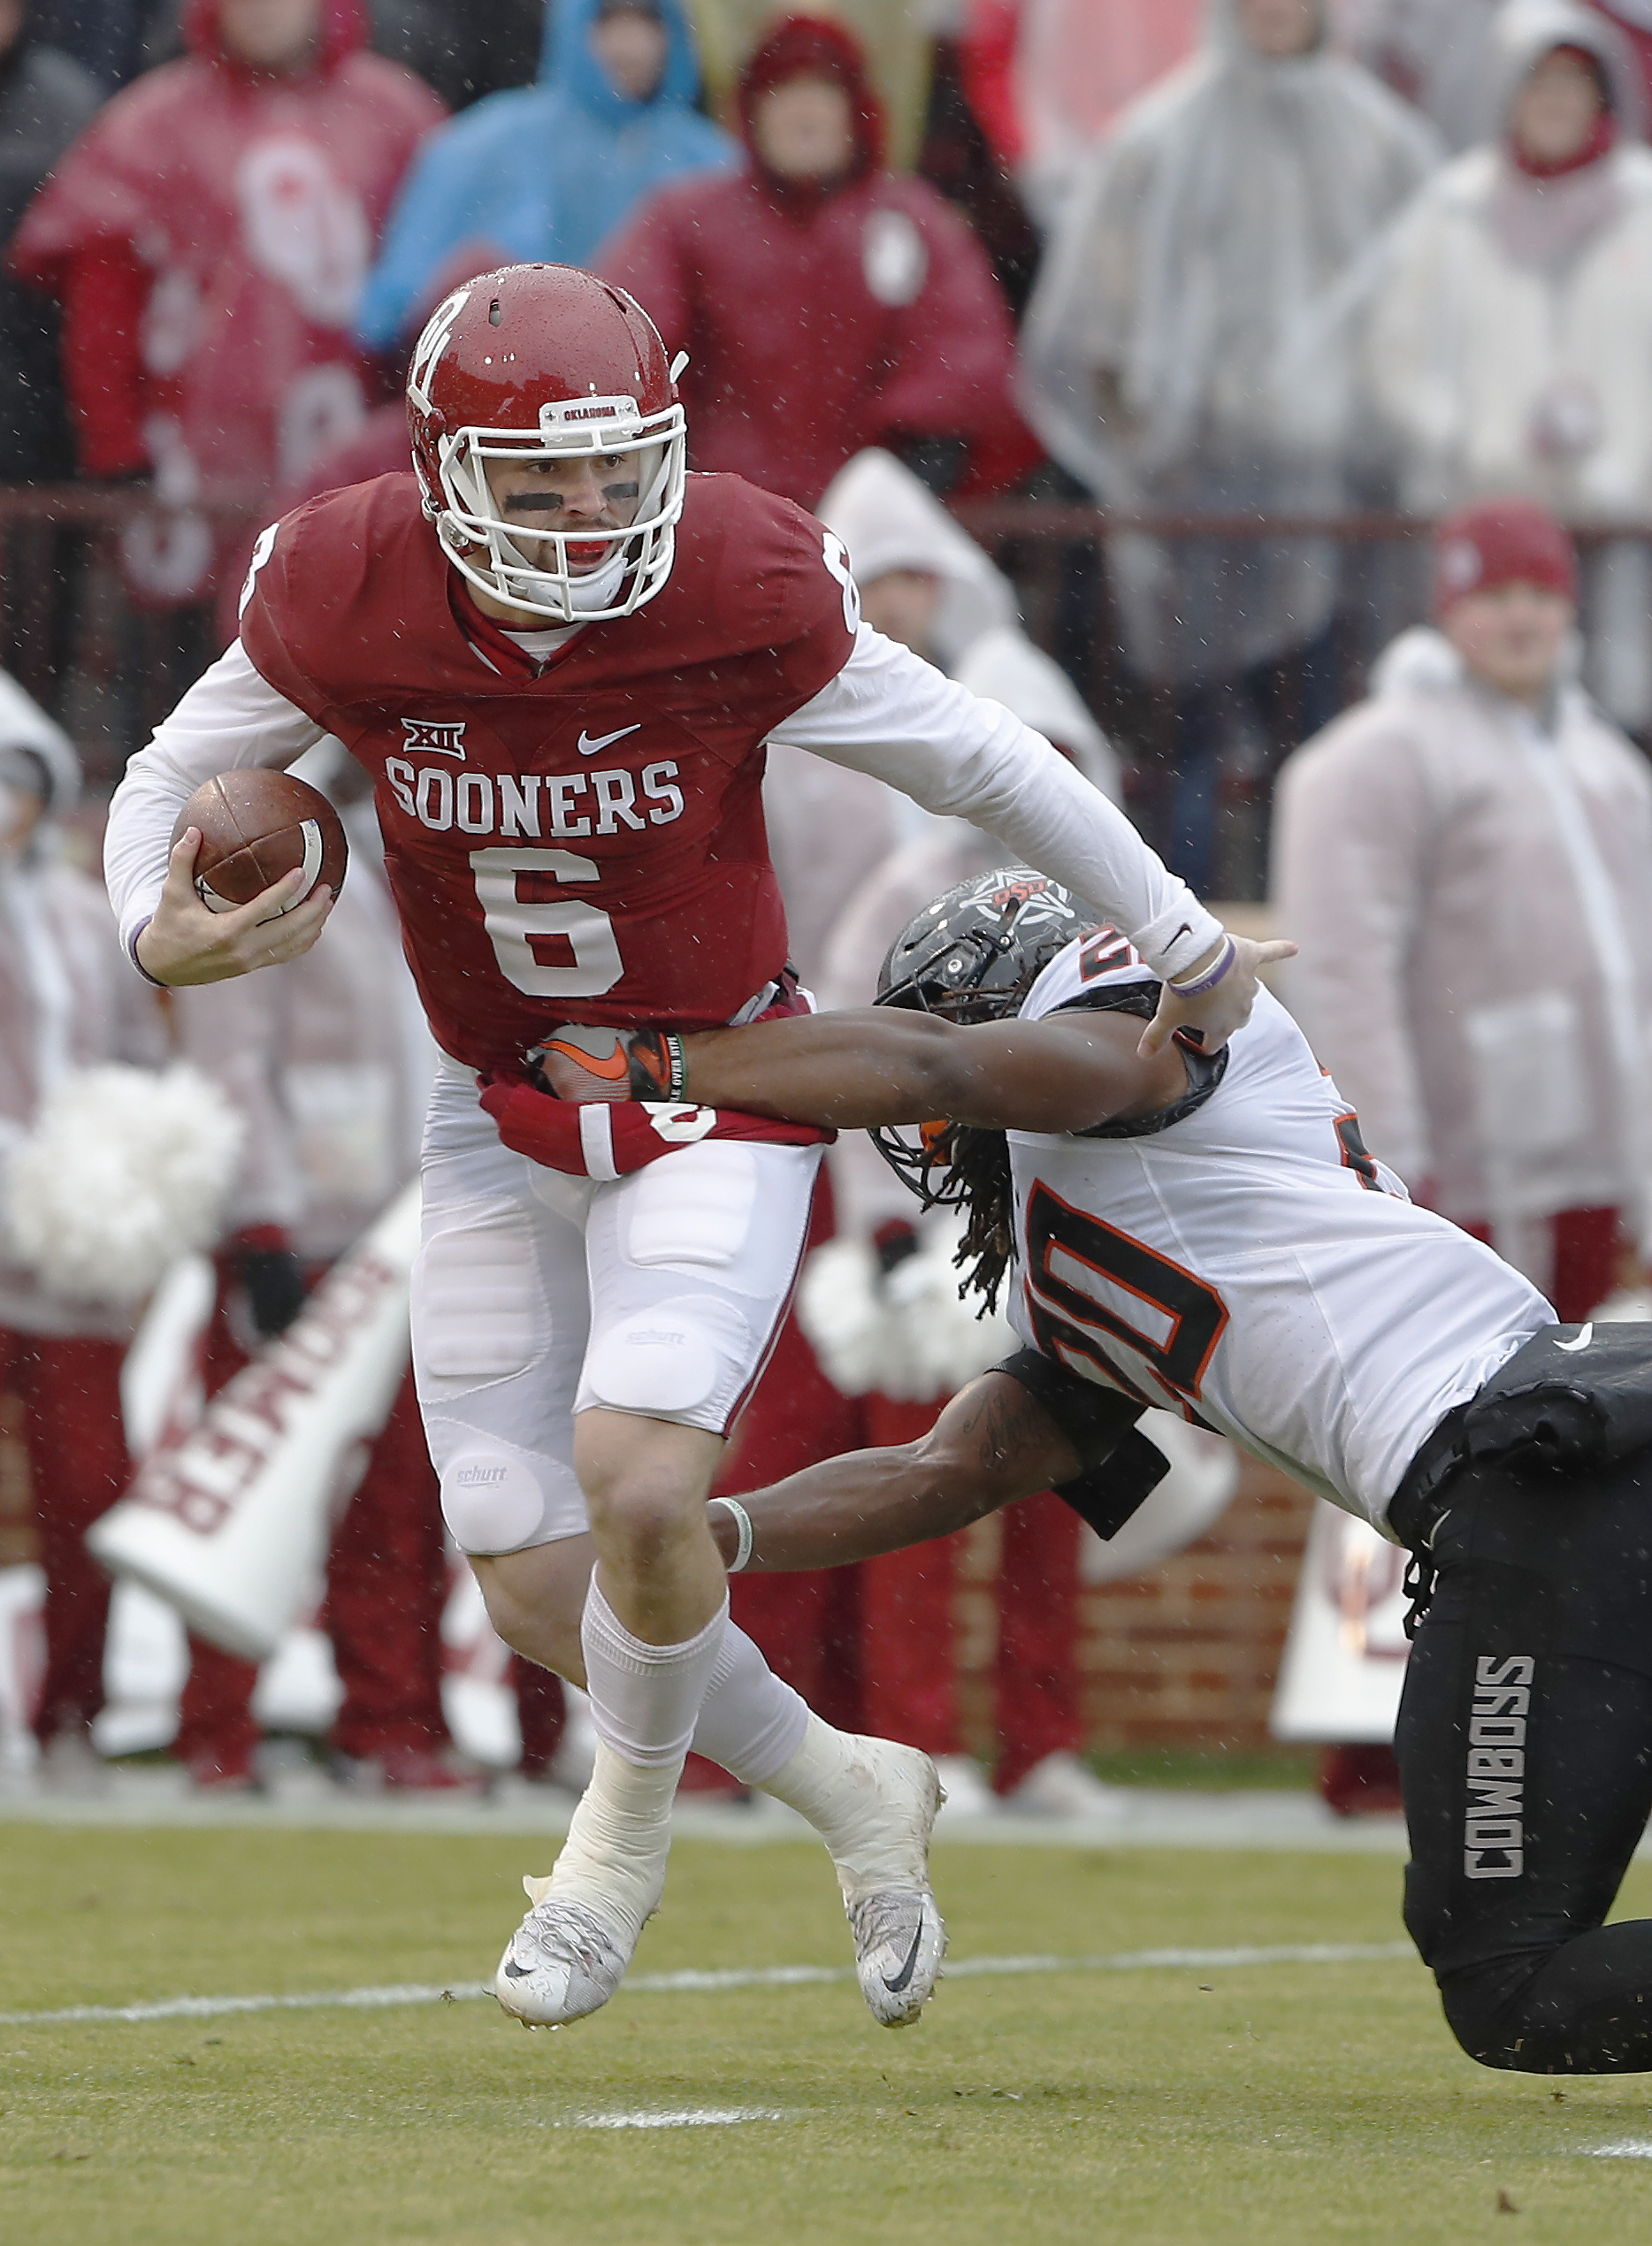 Oklahoma quarterback Baker Mayfield (6) is sacked by Oklahoma State linebacker Jordan Burton (20) during the first half of an NCAA college football game, Saturday, Dec. 3, 2016, in Norman, Okla. (AP Photo/Alonzo Adams)